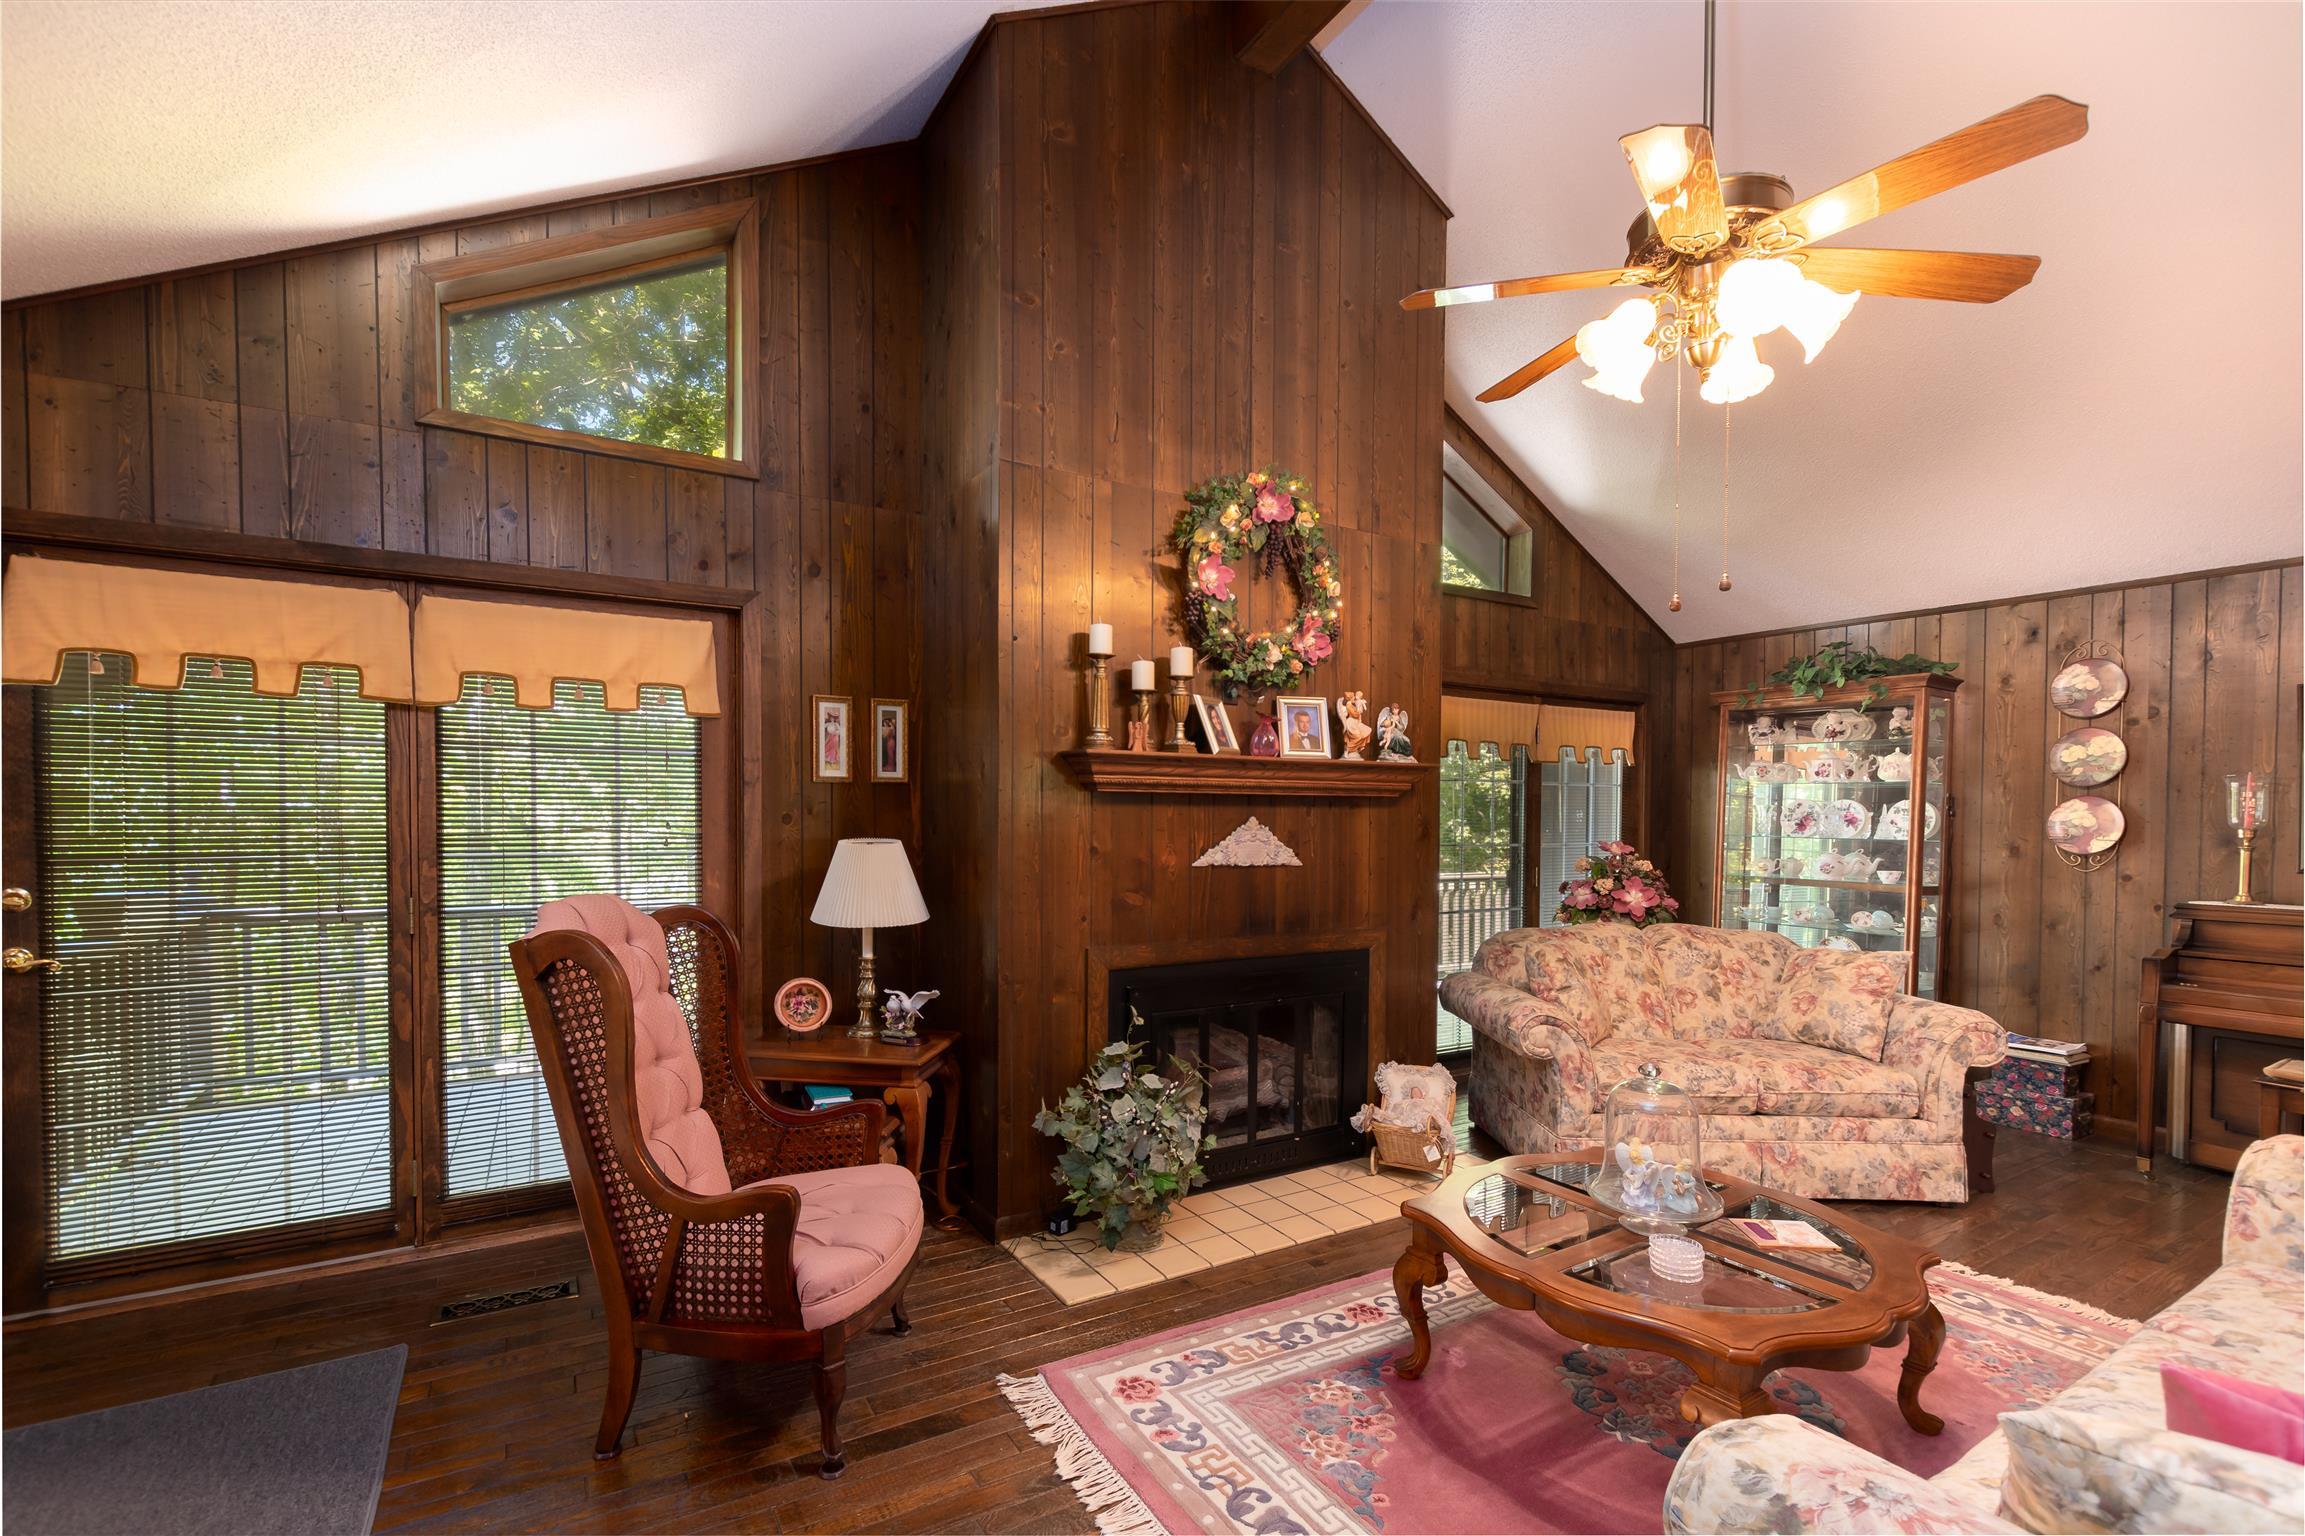 73 Timberglade Ln, Parsons, TN 38363 - Parsons, TN real estate listing